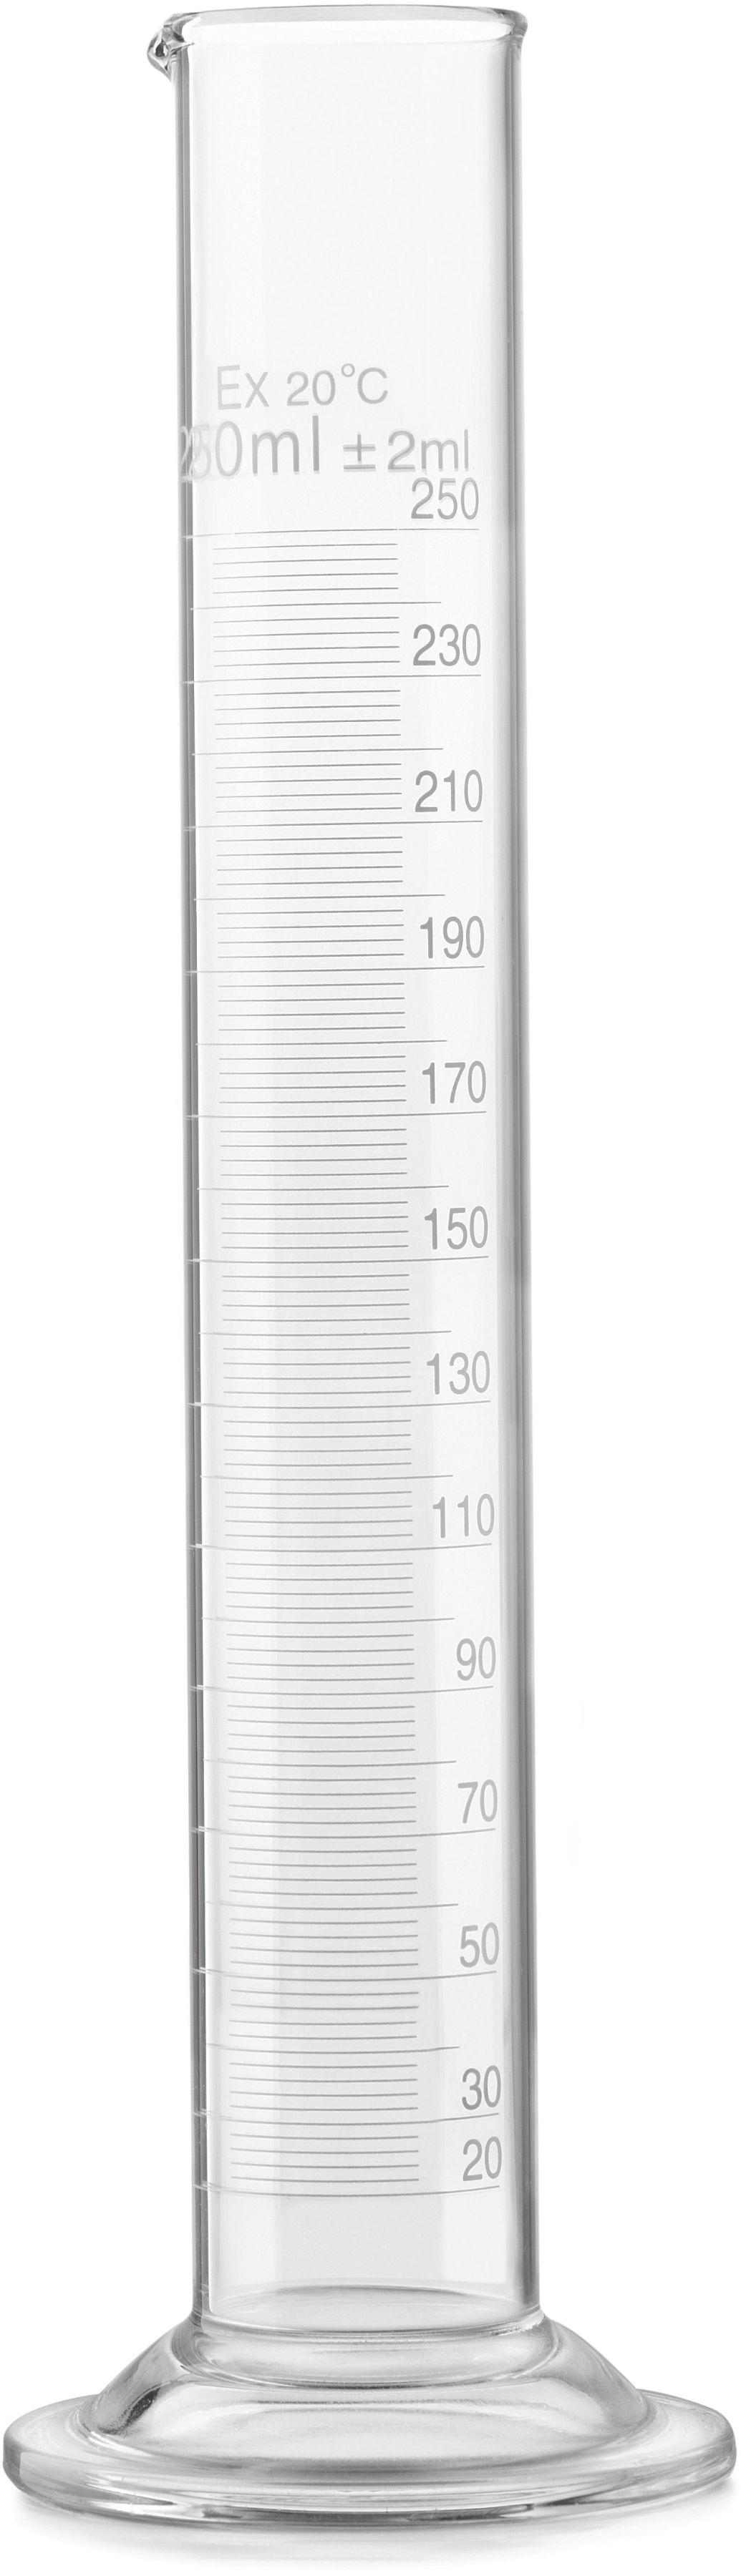 Menzurka 500 ml Chemistry With Lab Libbey